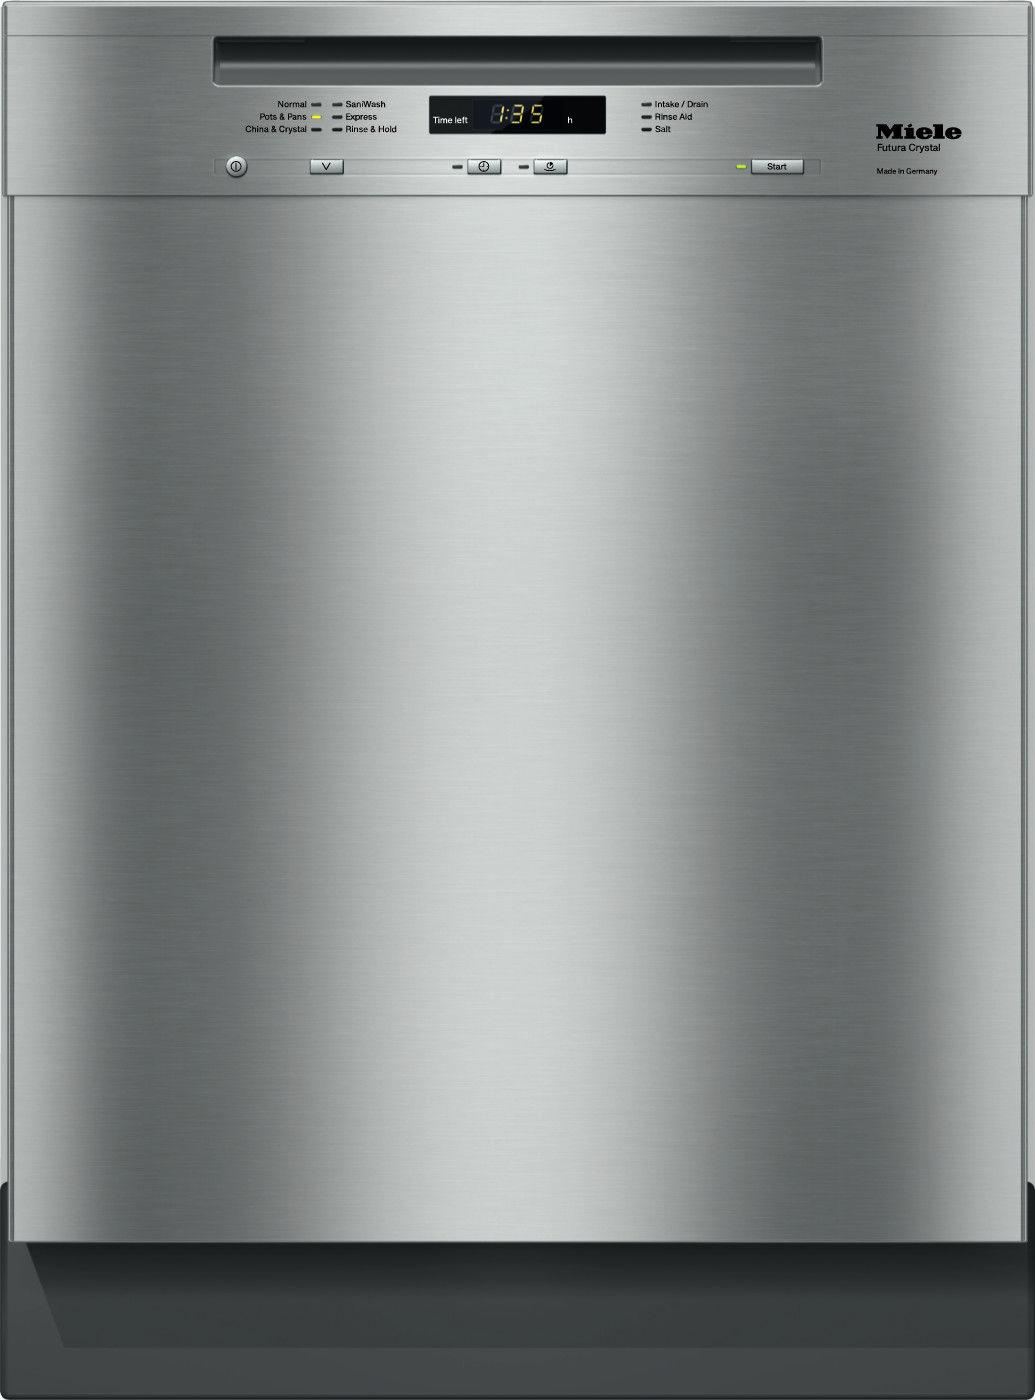 Miele G 6105 U Clst Futura Crystal Miele Dishwasher Built In Dishwasher Cutlery Tray